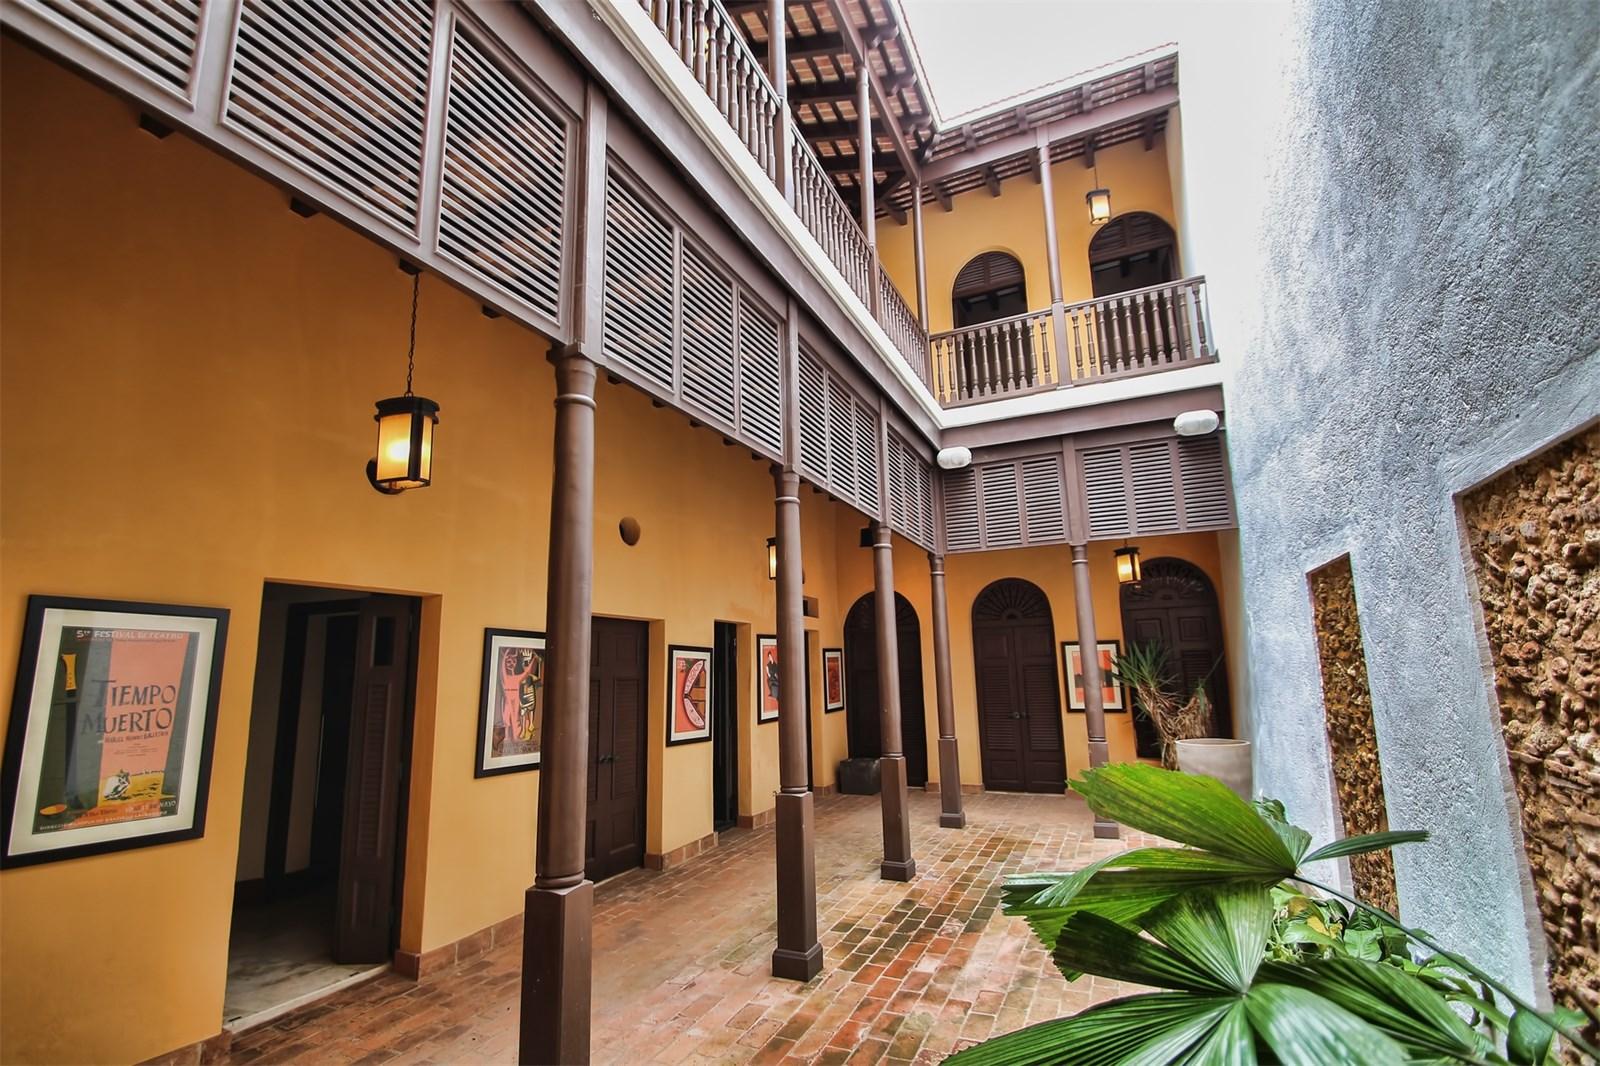 Calle Luna Townhouse › Rentals Old San Juan, Puerto Rico